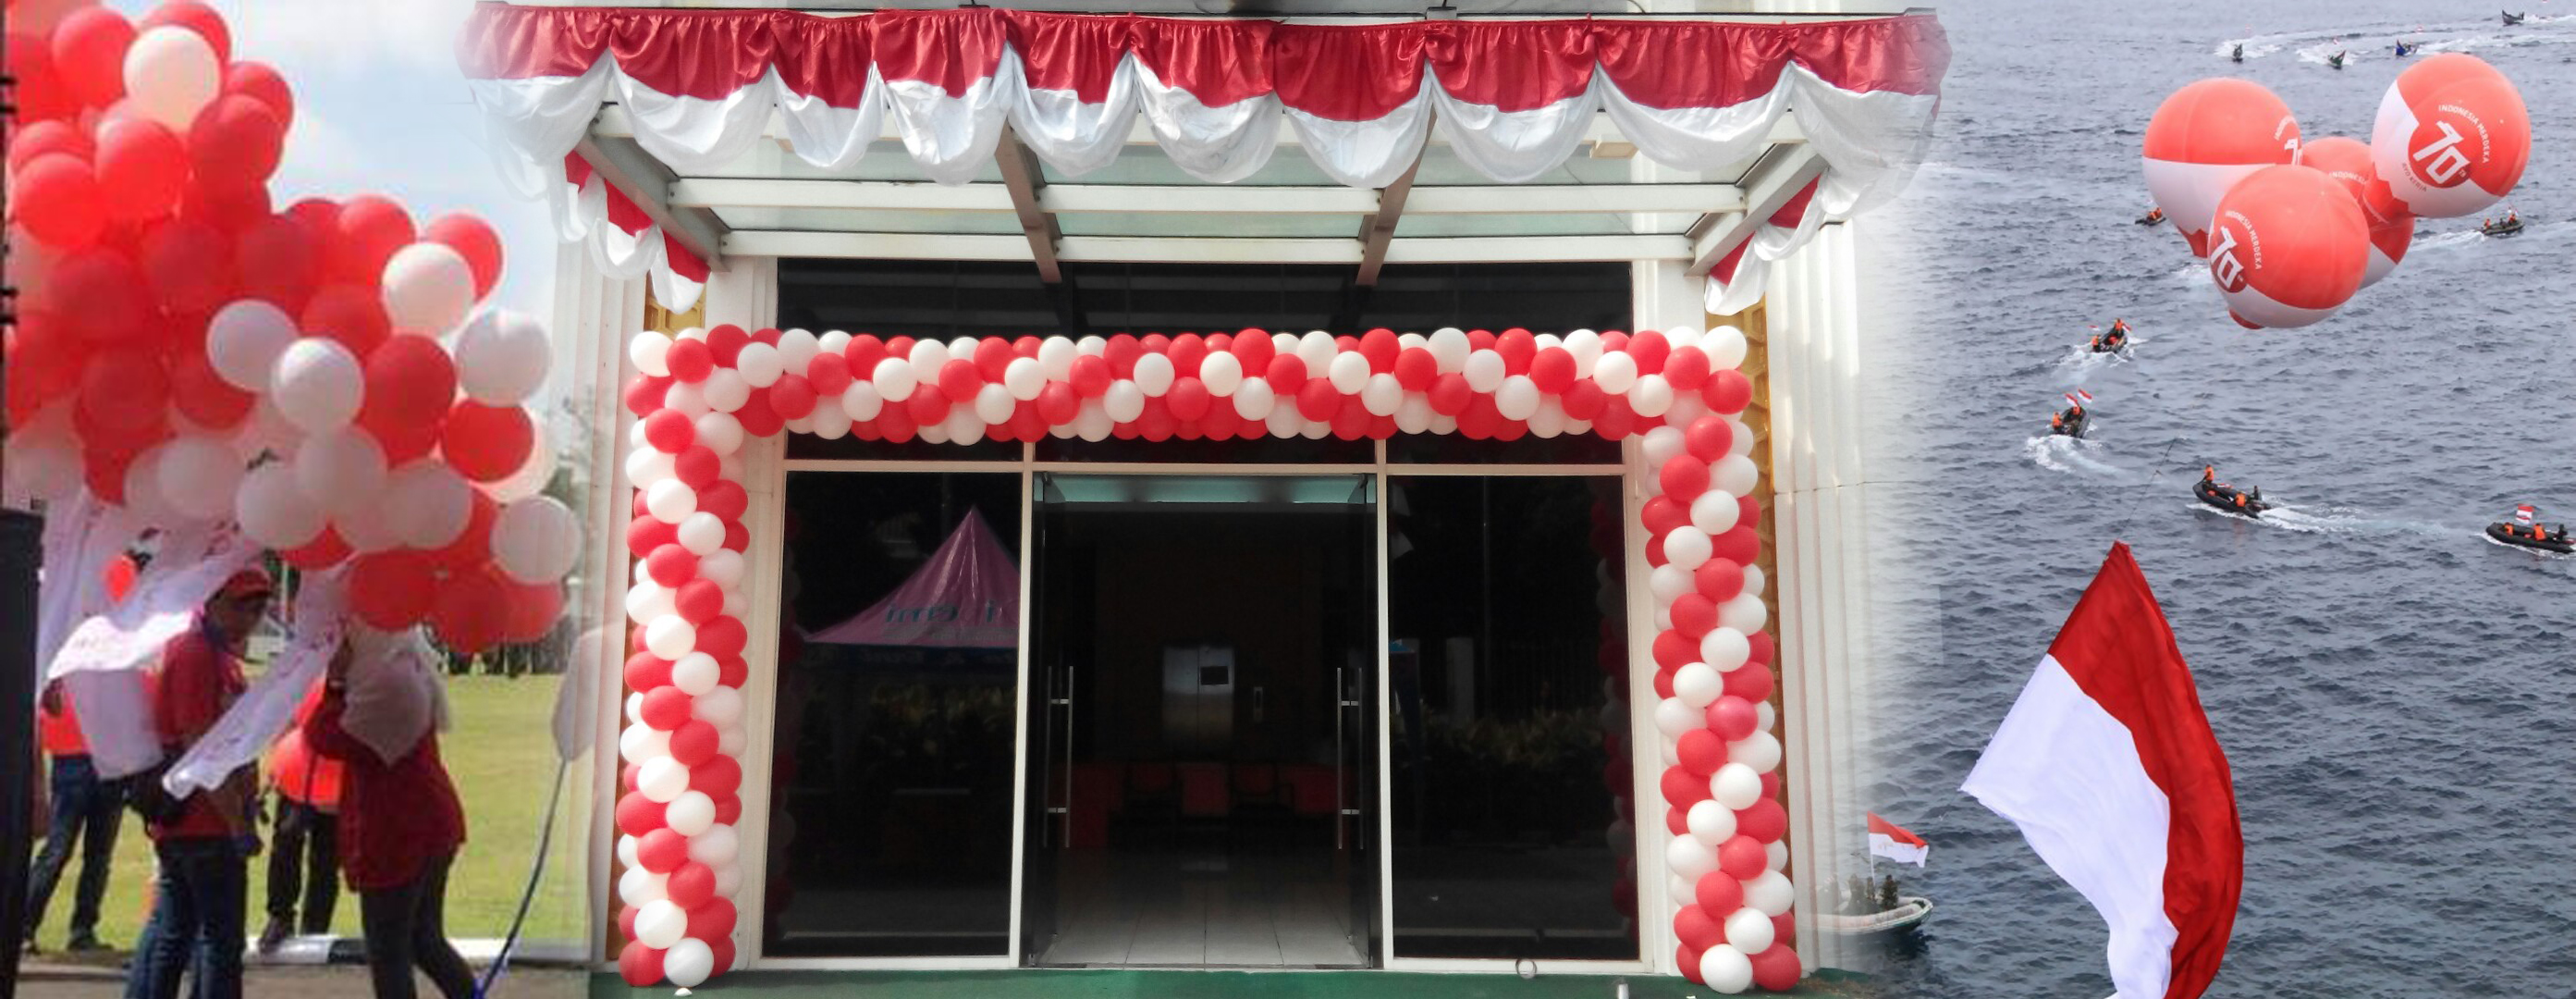 Balon dekorasi 17 agustus hut kemerdekaan indonesia for Dekor 17 agustus di hotel